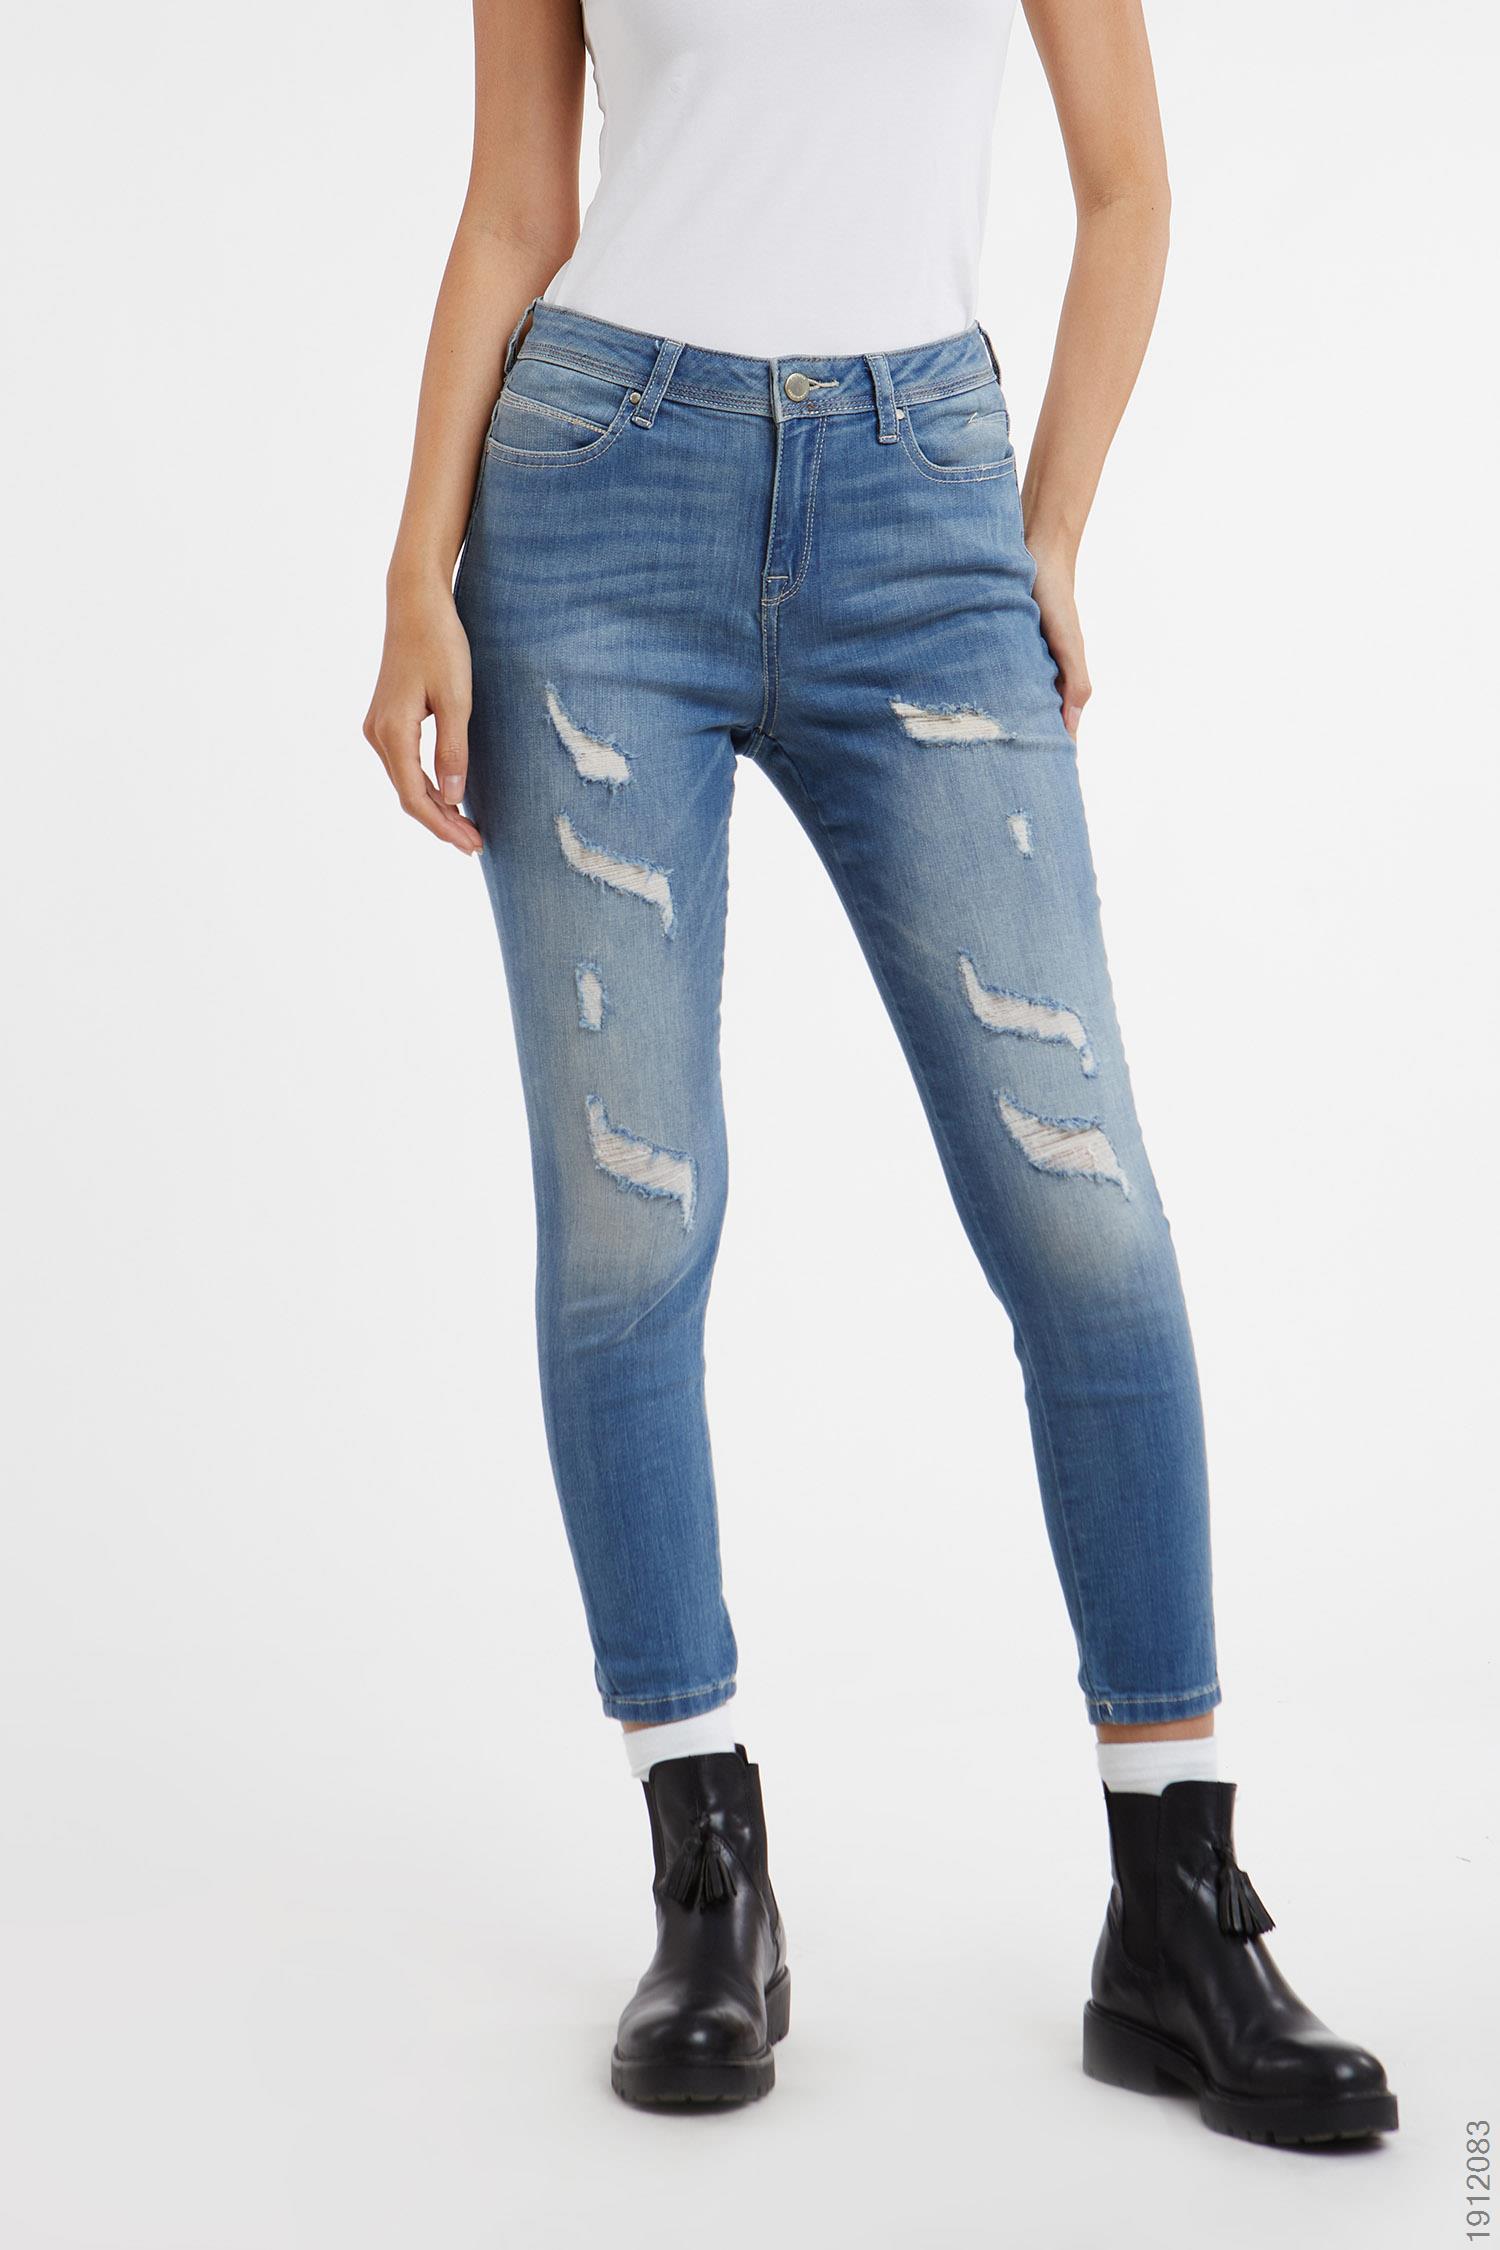 quần jean nữ - 1912083